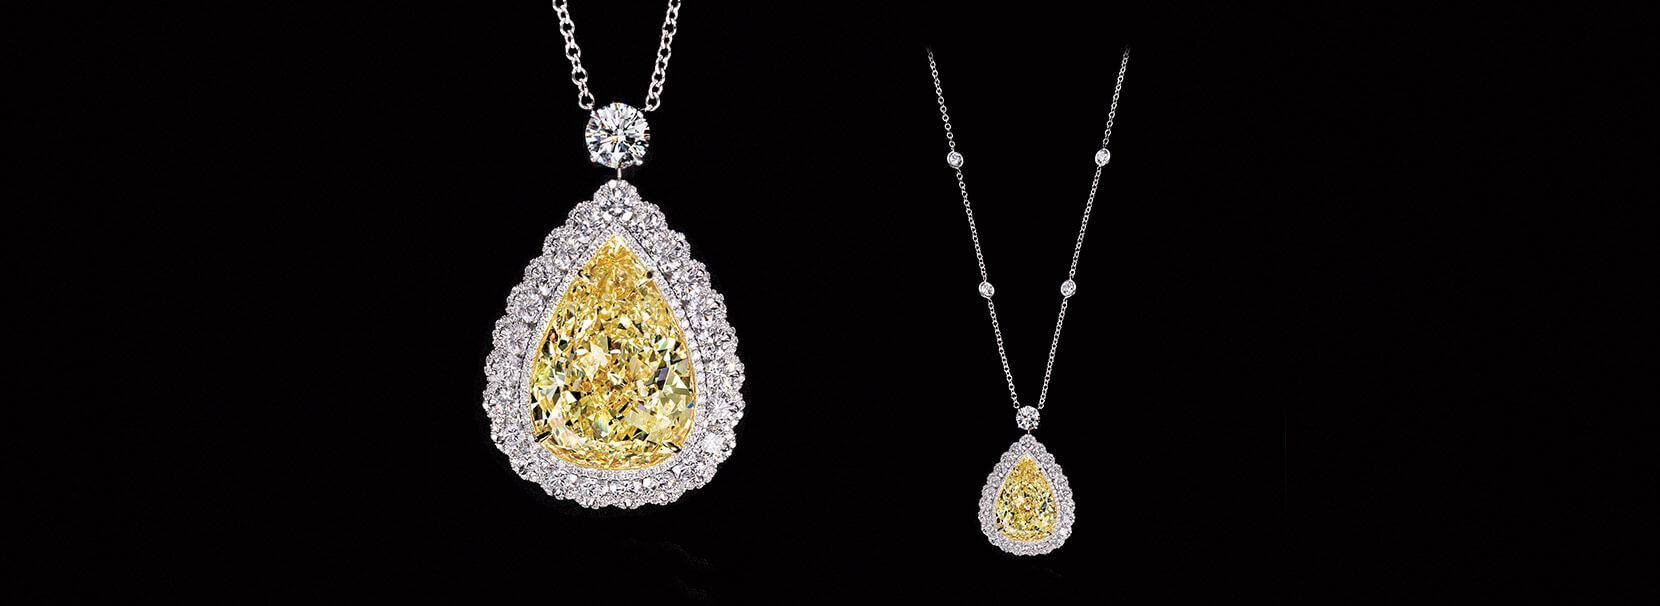 diamond necklaces by Diamante atelier